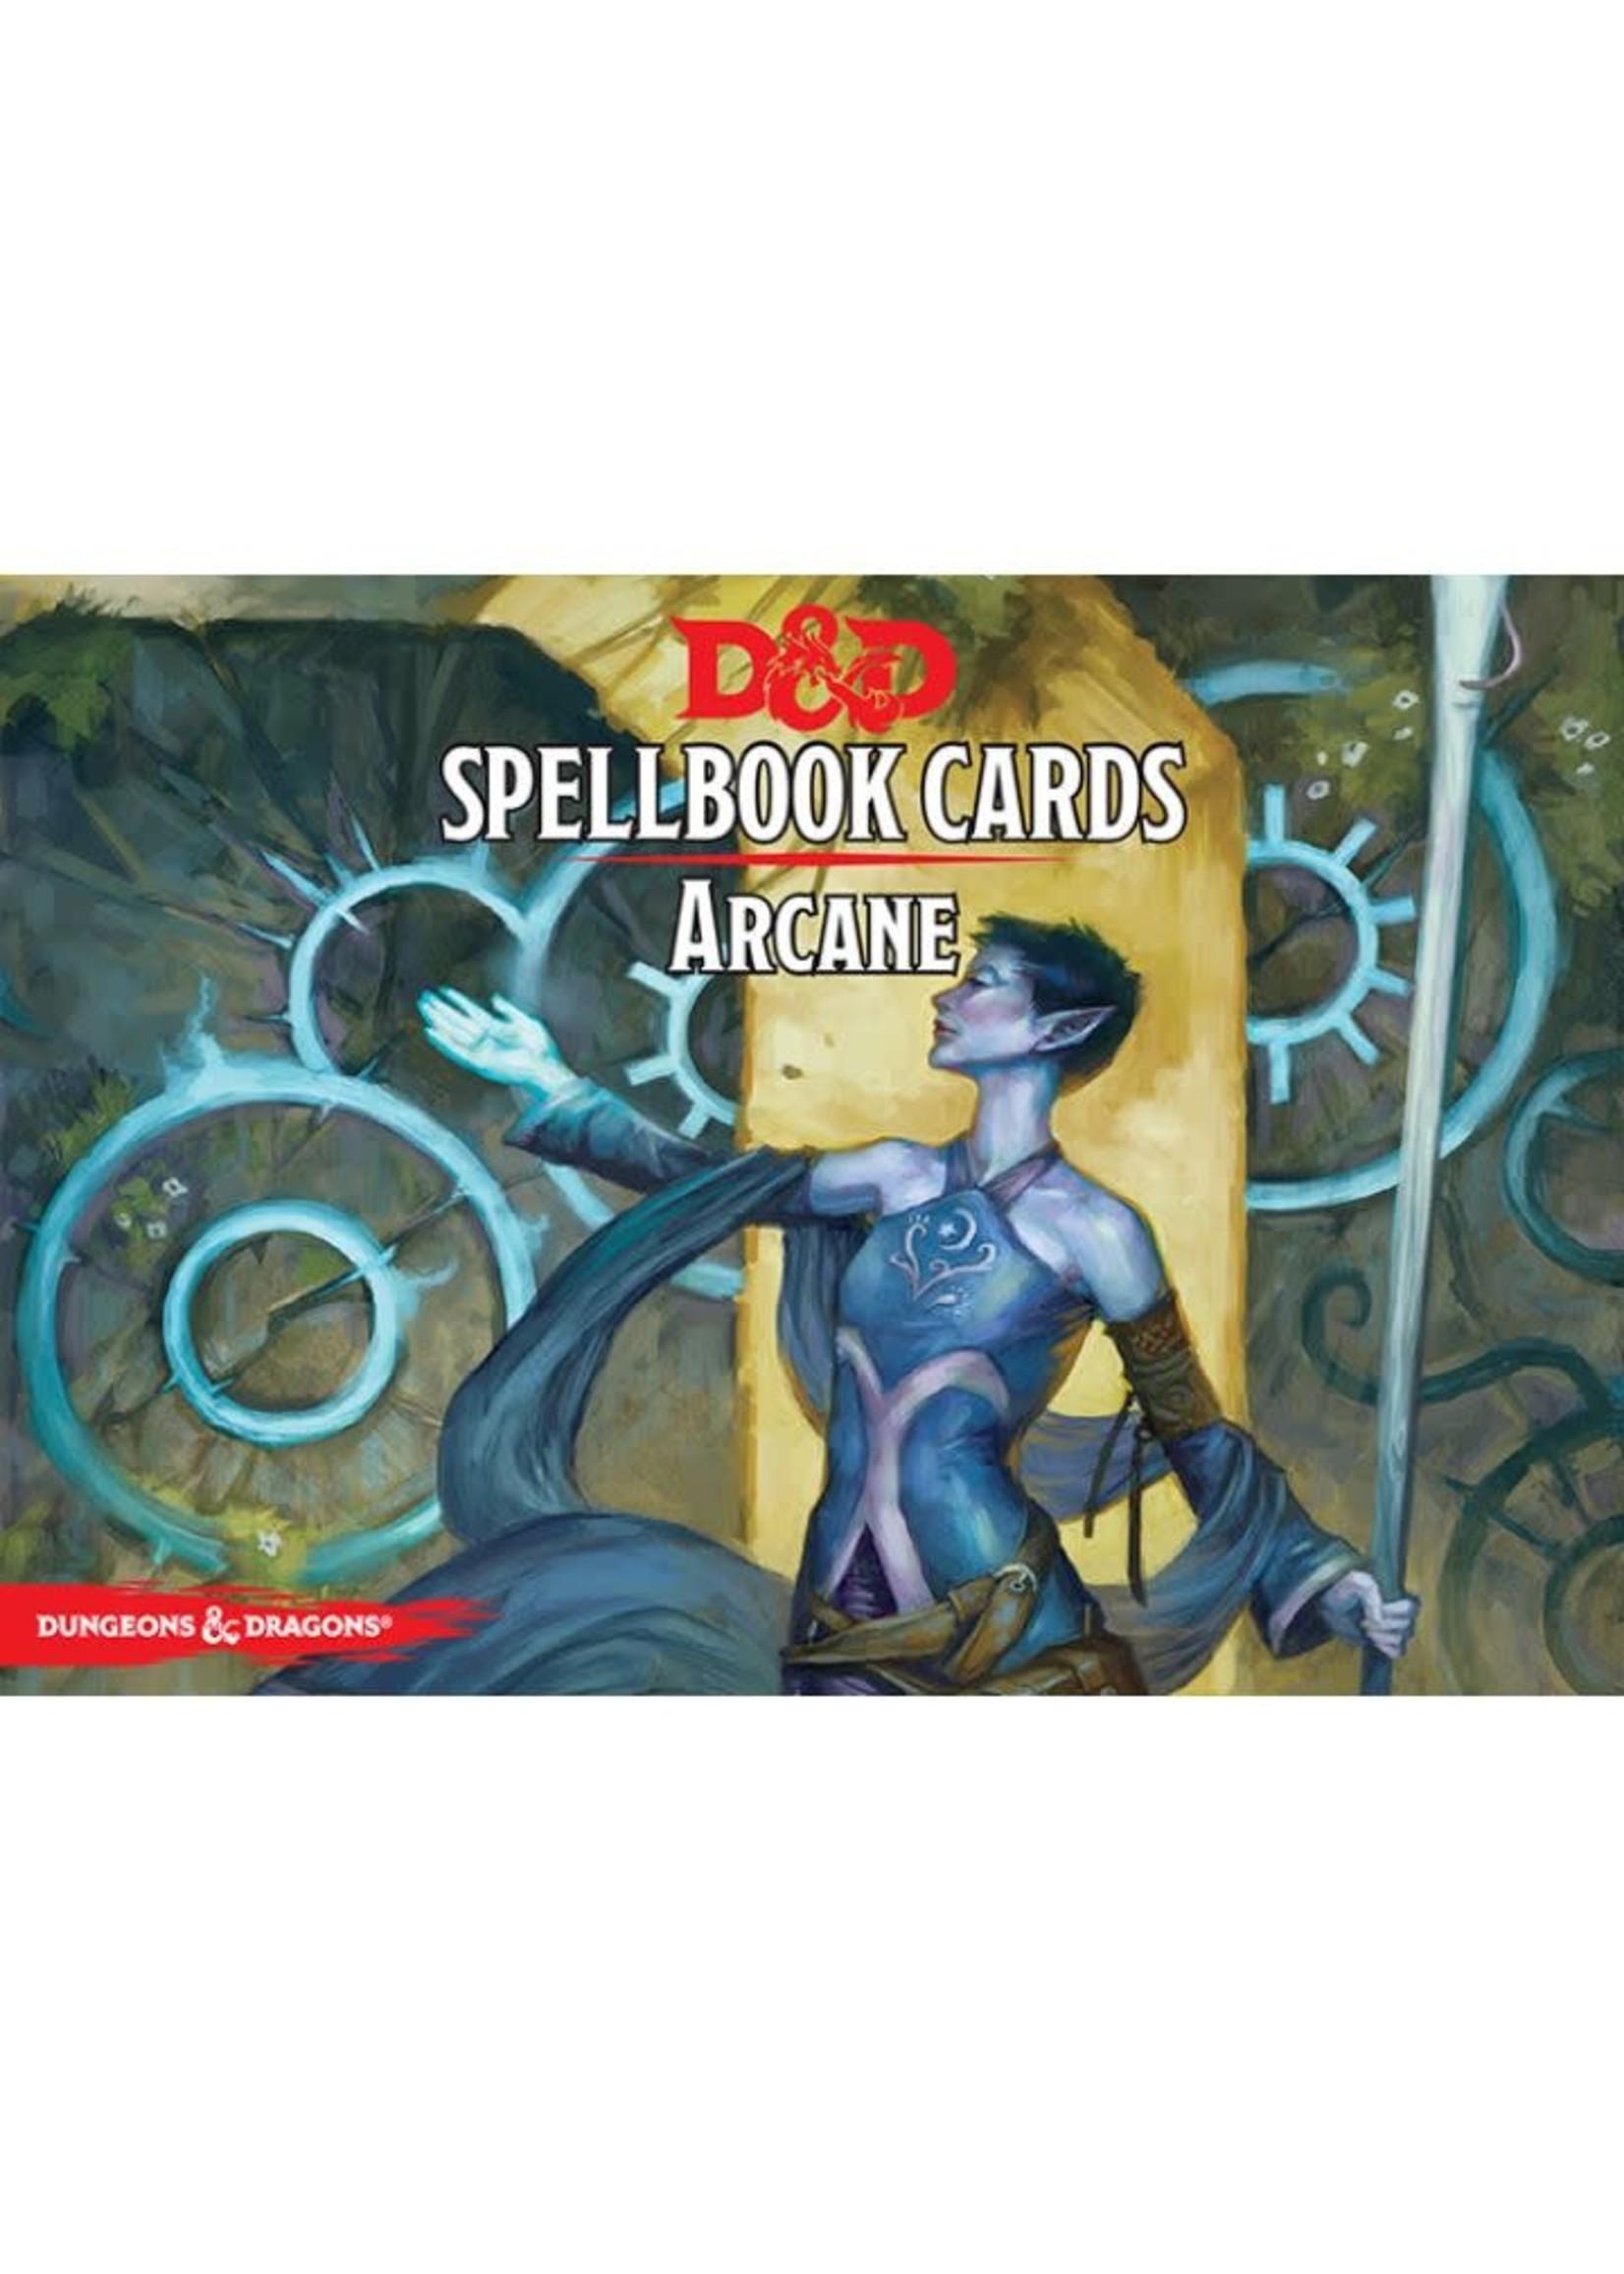 D&D Spellbook Cards Arcane